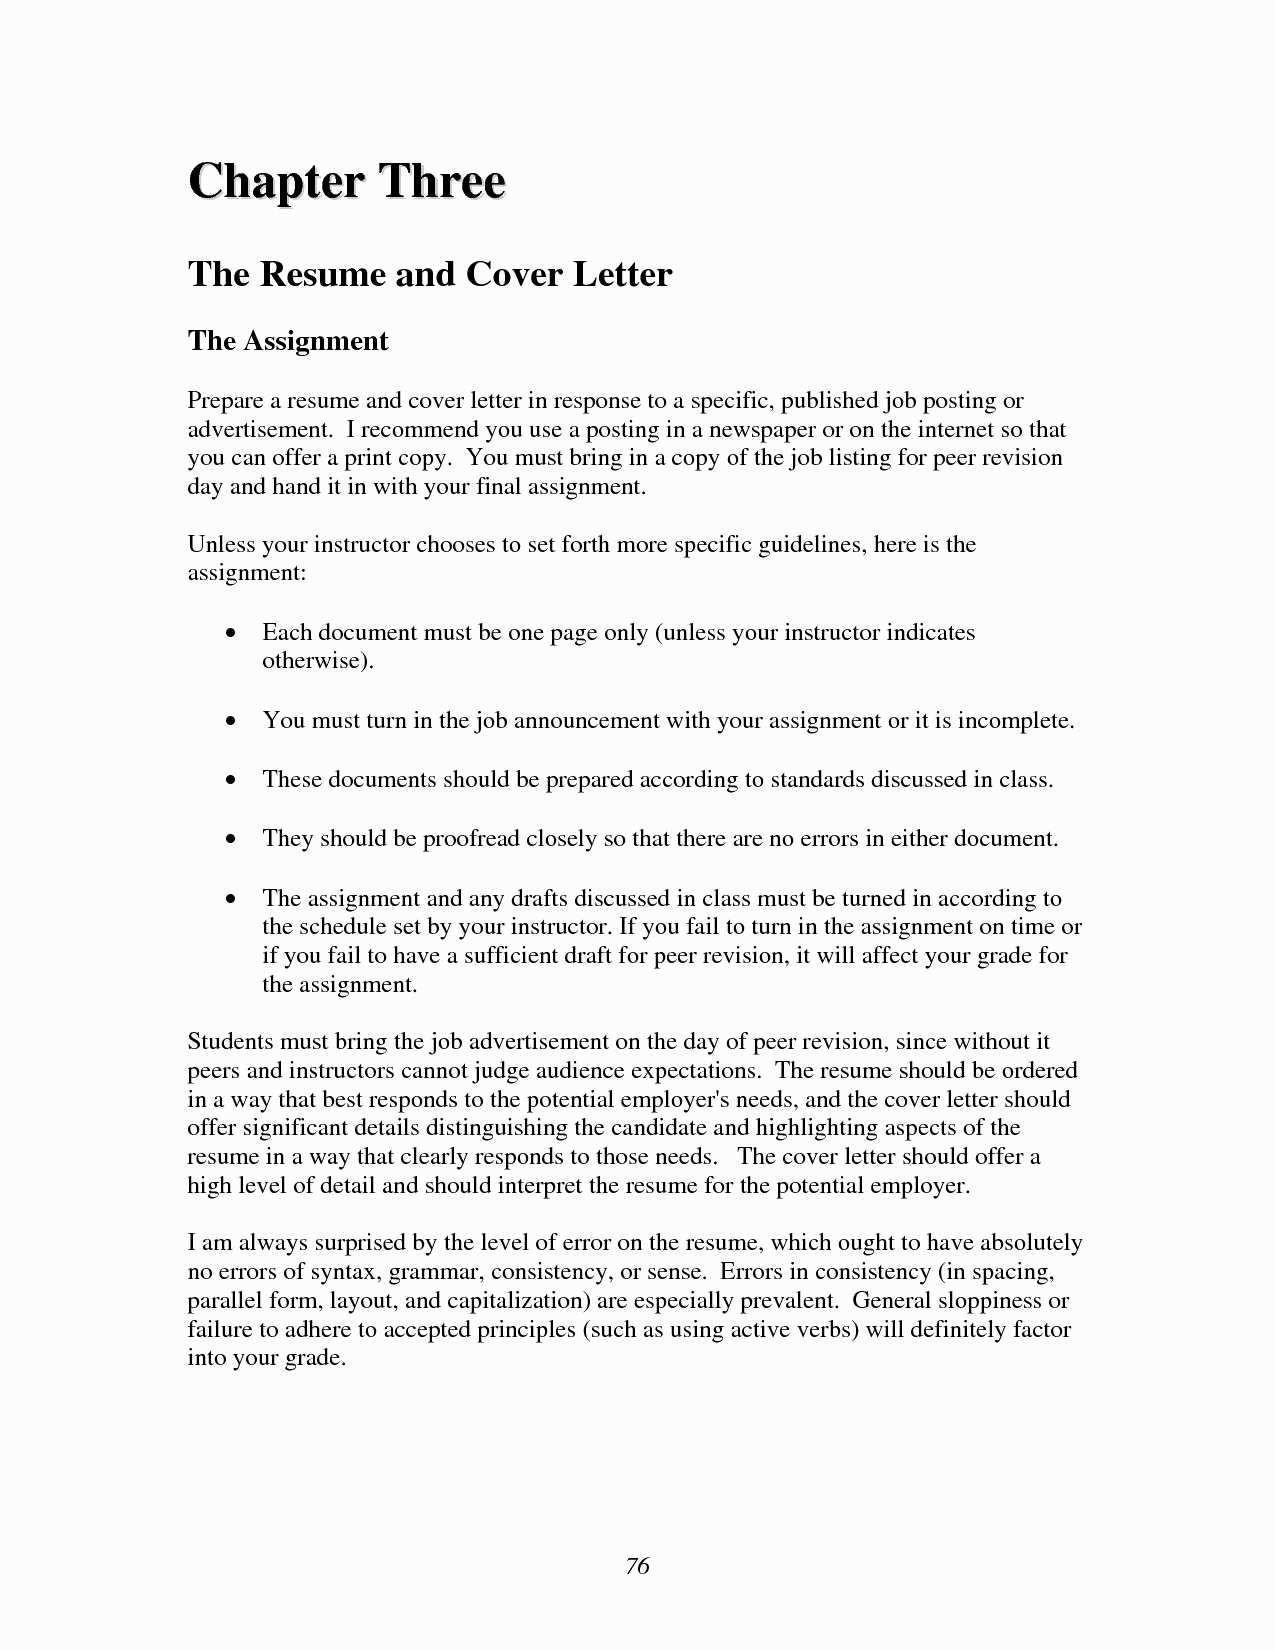 Sample Job Offer Letter Template - Job Fer Letter Template Us Copy Od Consultant Cover Letter Fungram